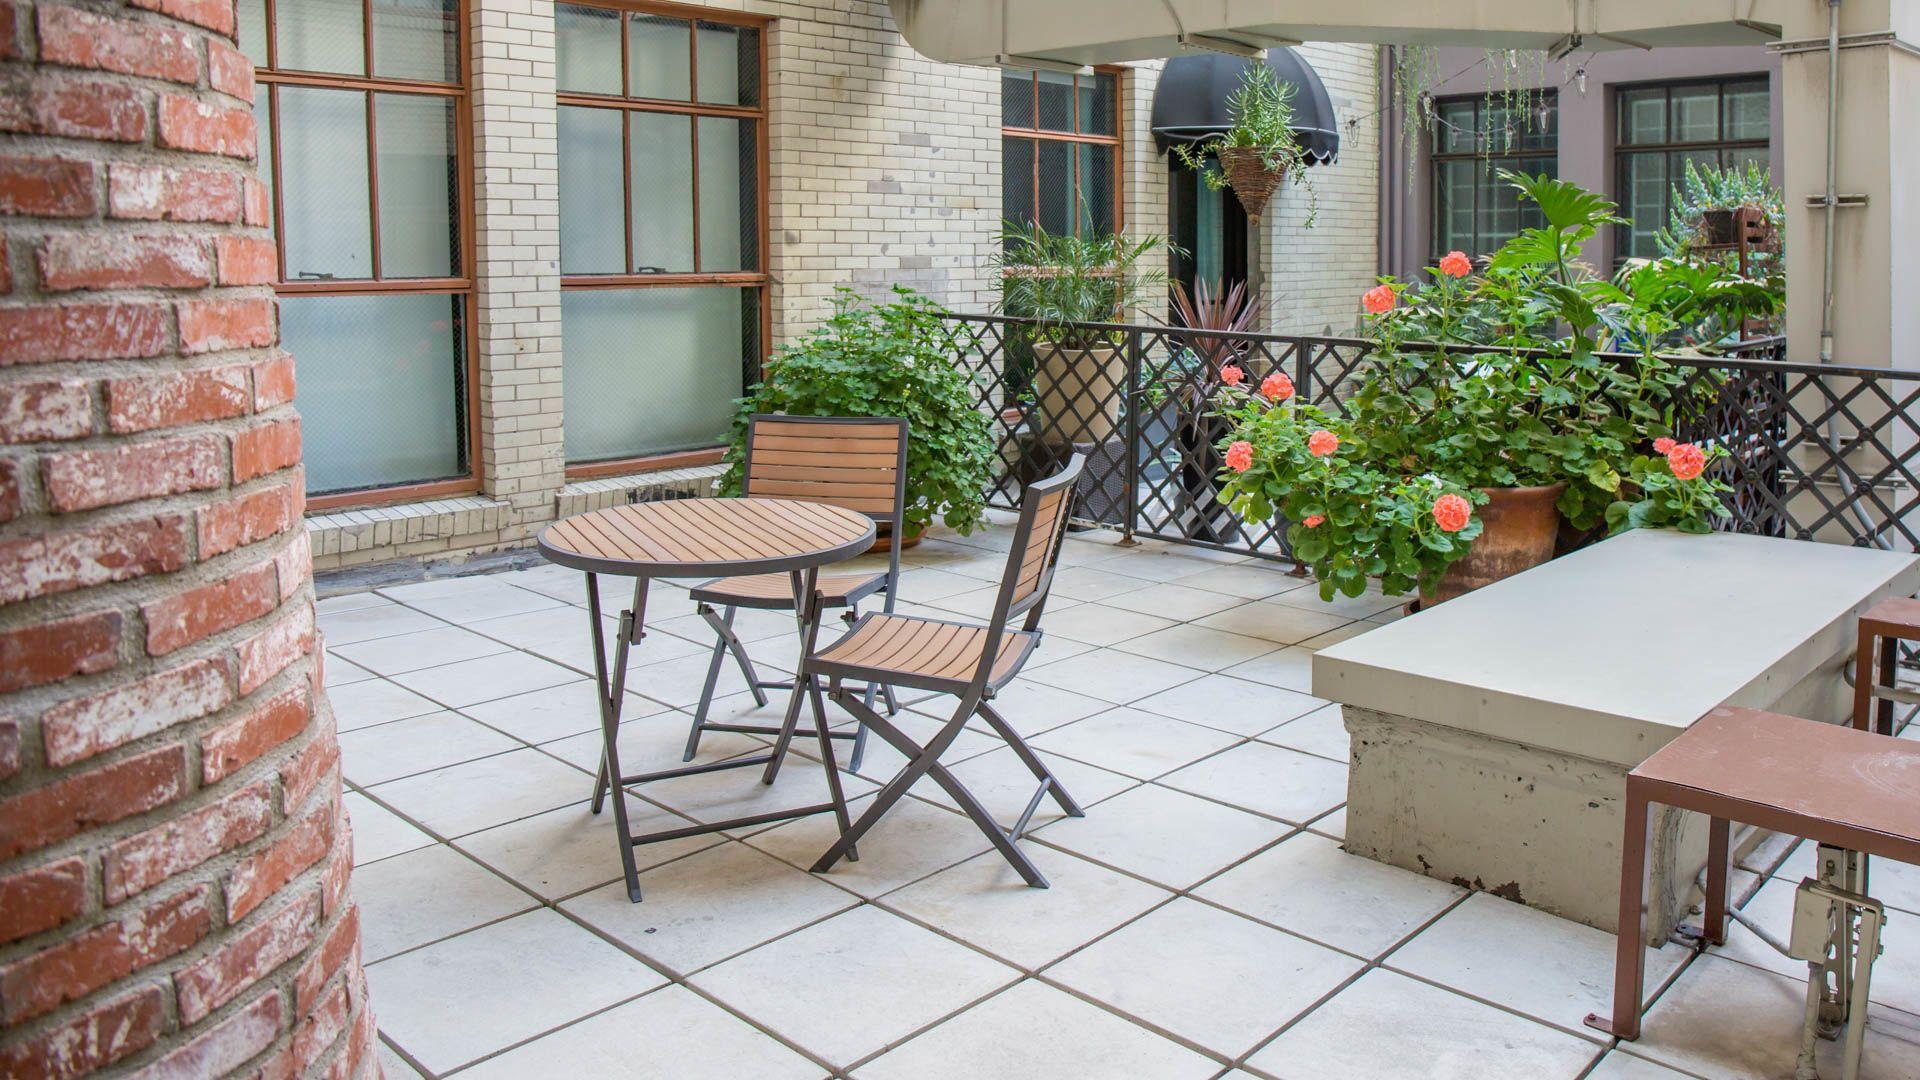 Milano Lofts Apartments - Outdoor